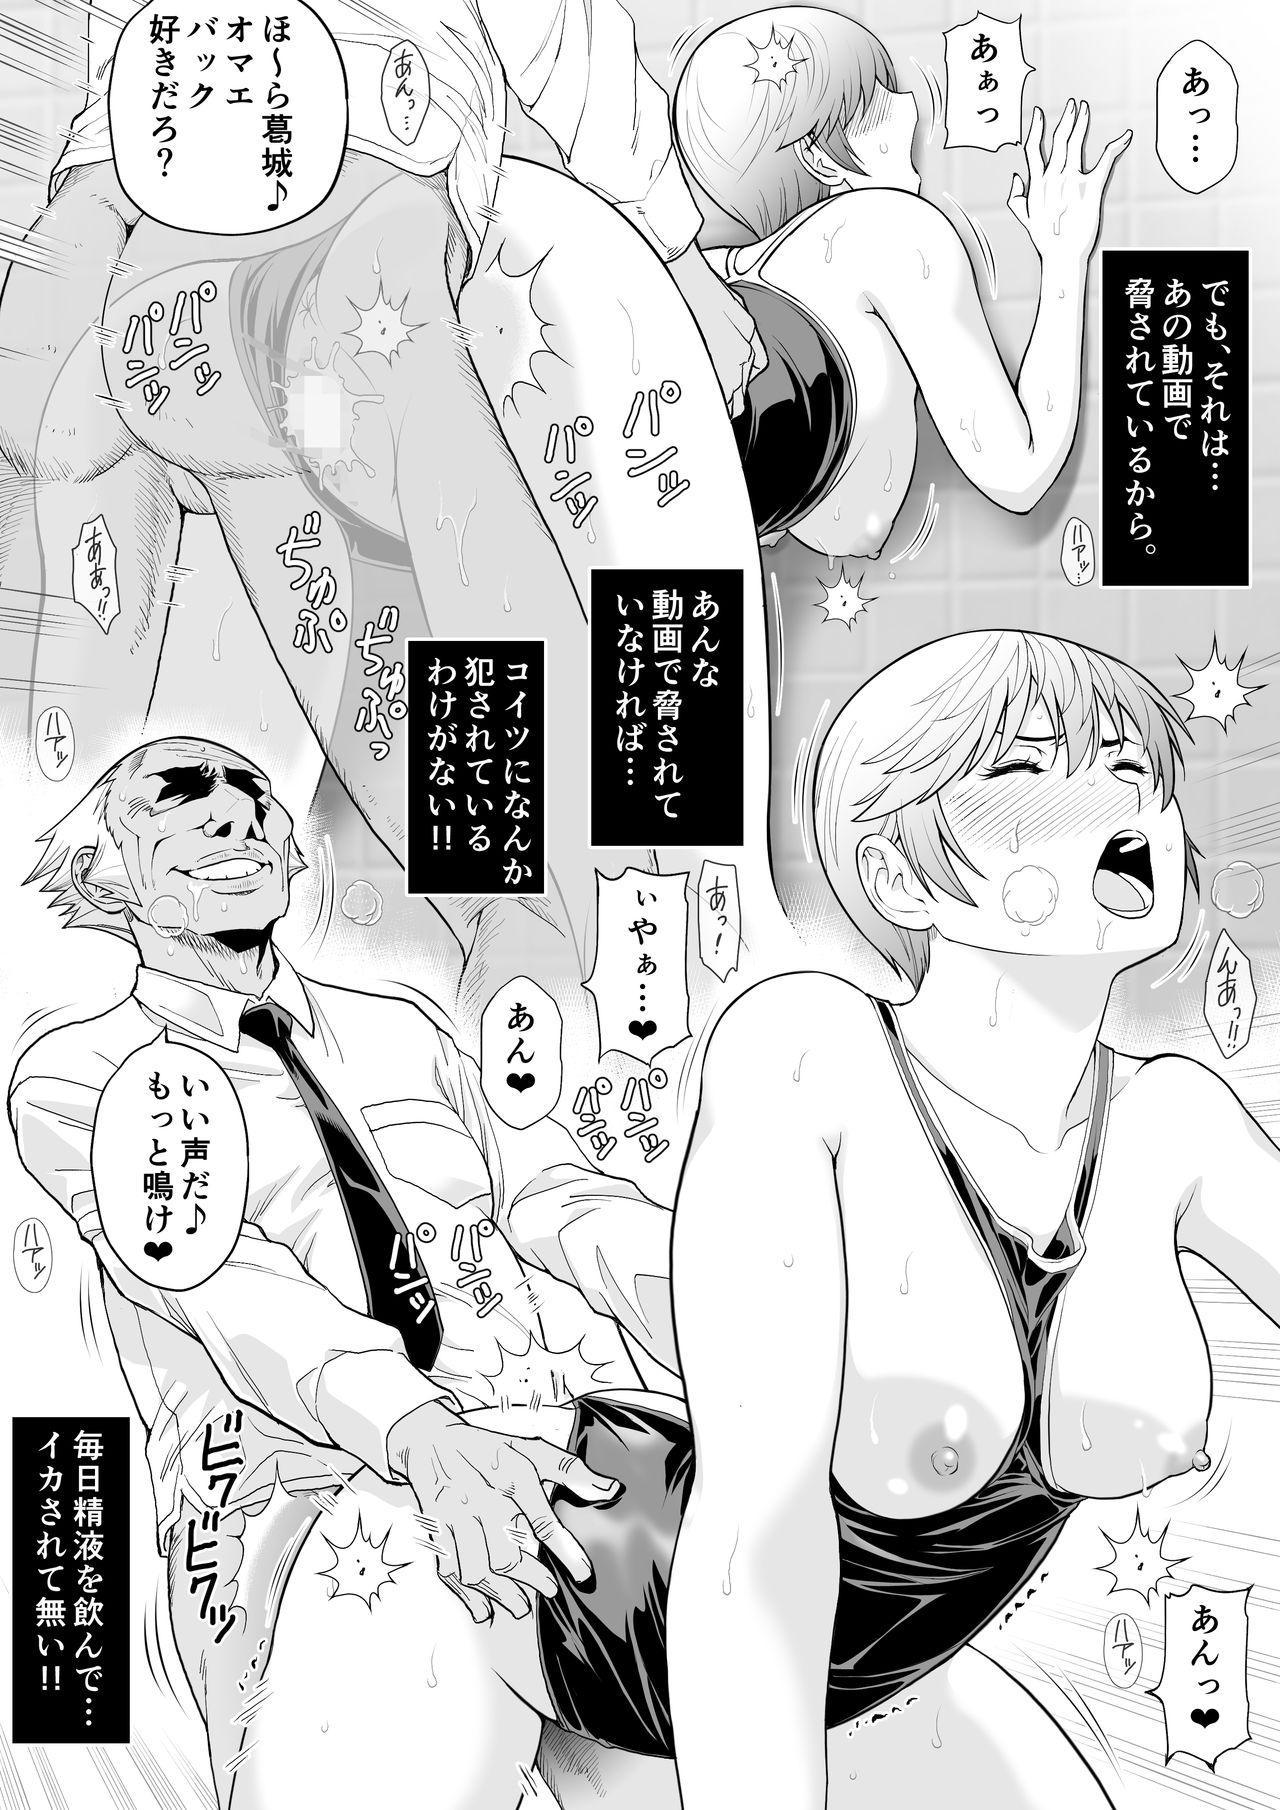 Namaiki mmusume ni tsuyo ● ikīki jugyō 55